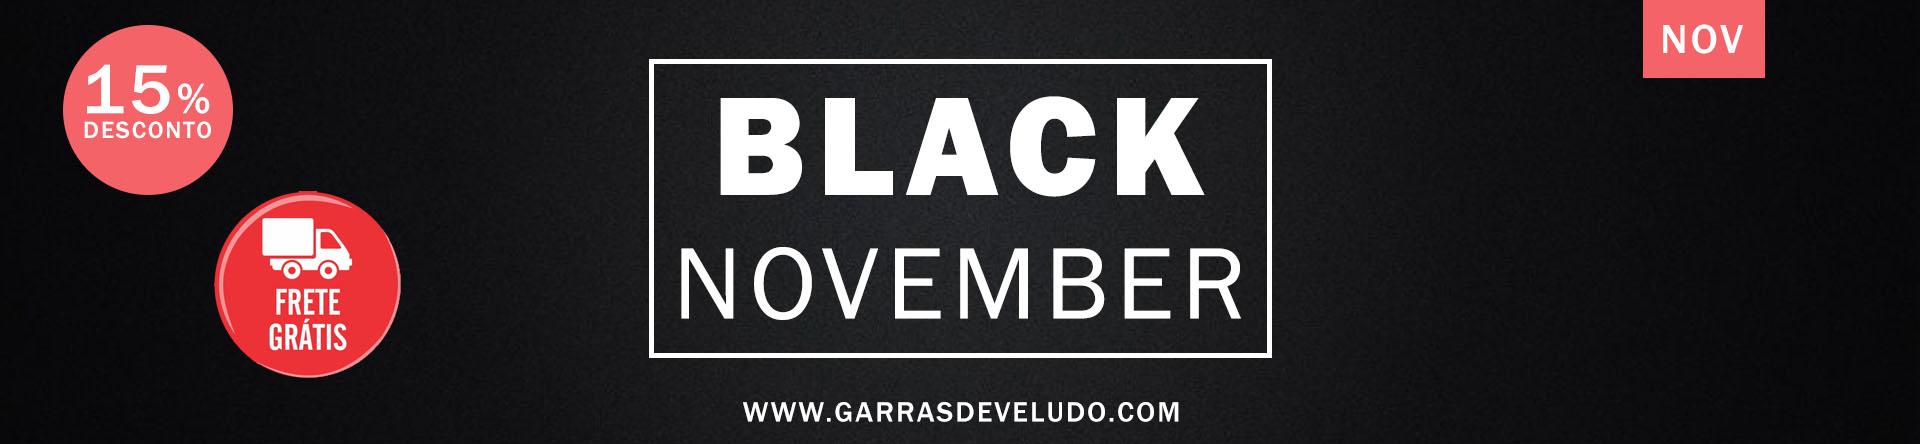 Black novemer